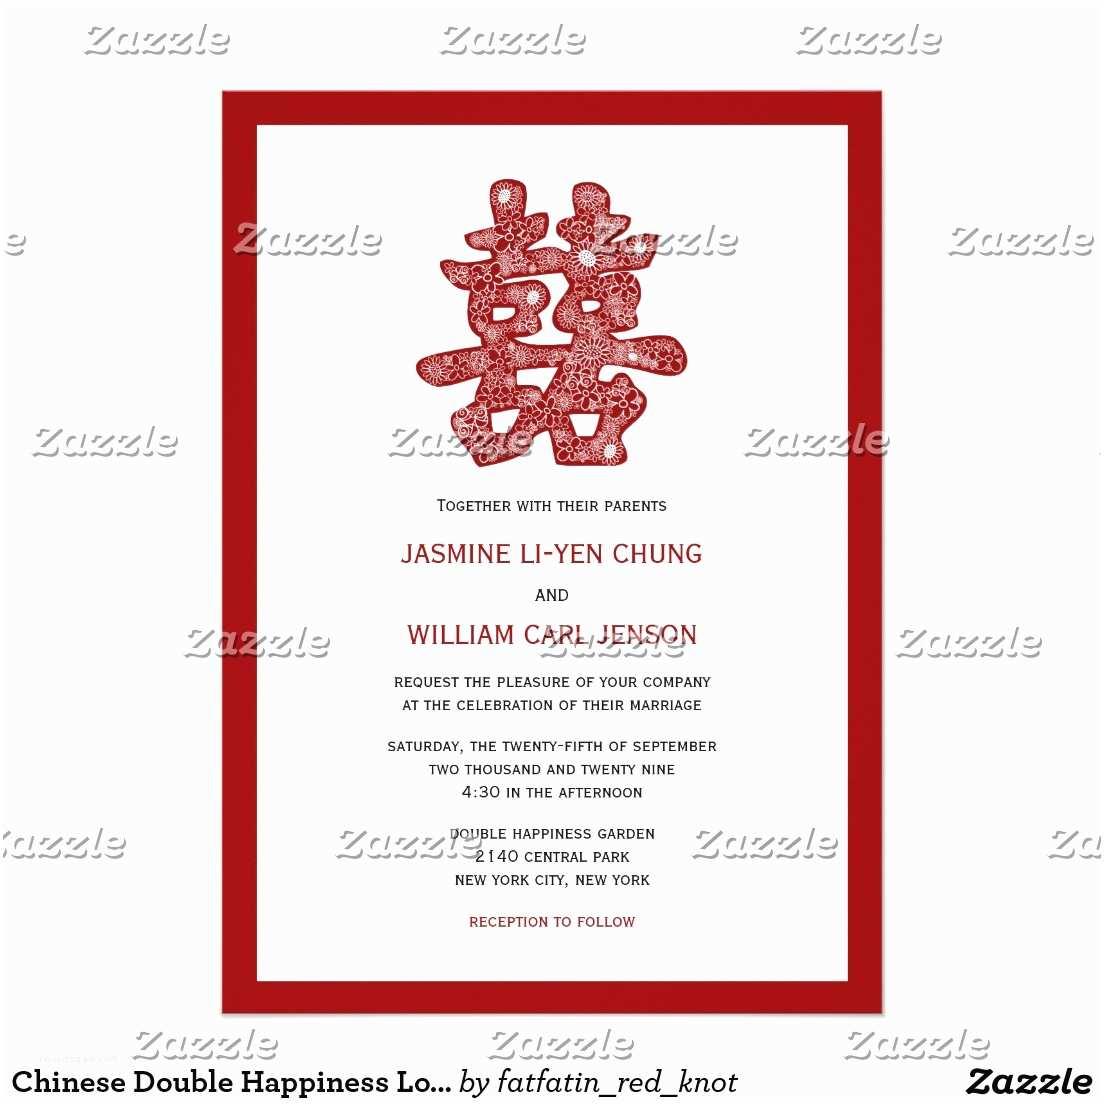 Chinese Wedding Invitation Template Chinese Wedding Invitation Rectangle Potrait White Red